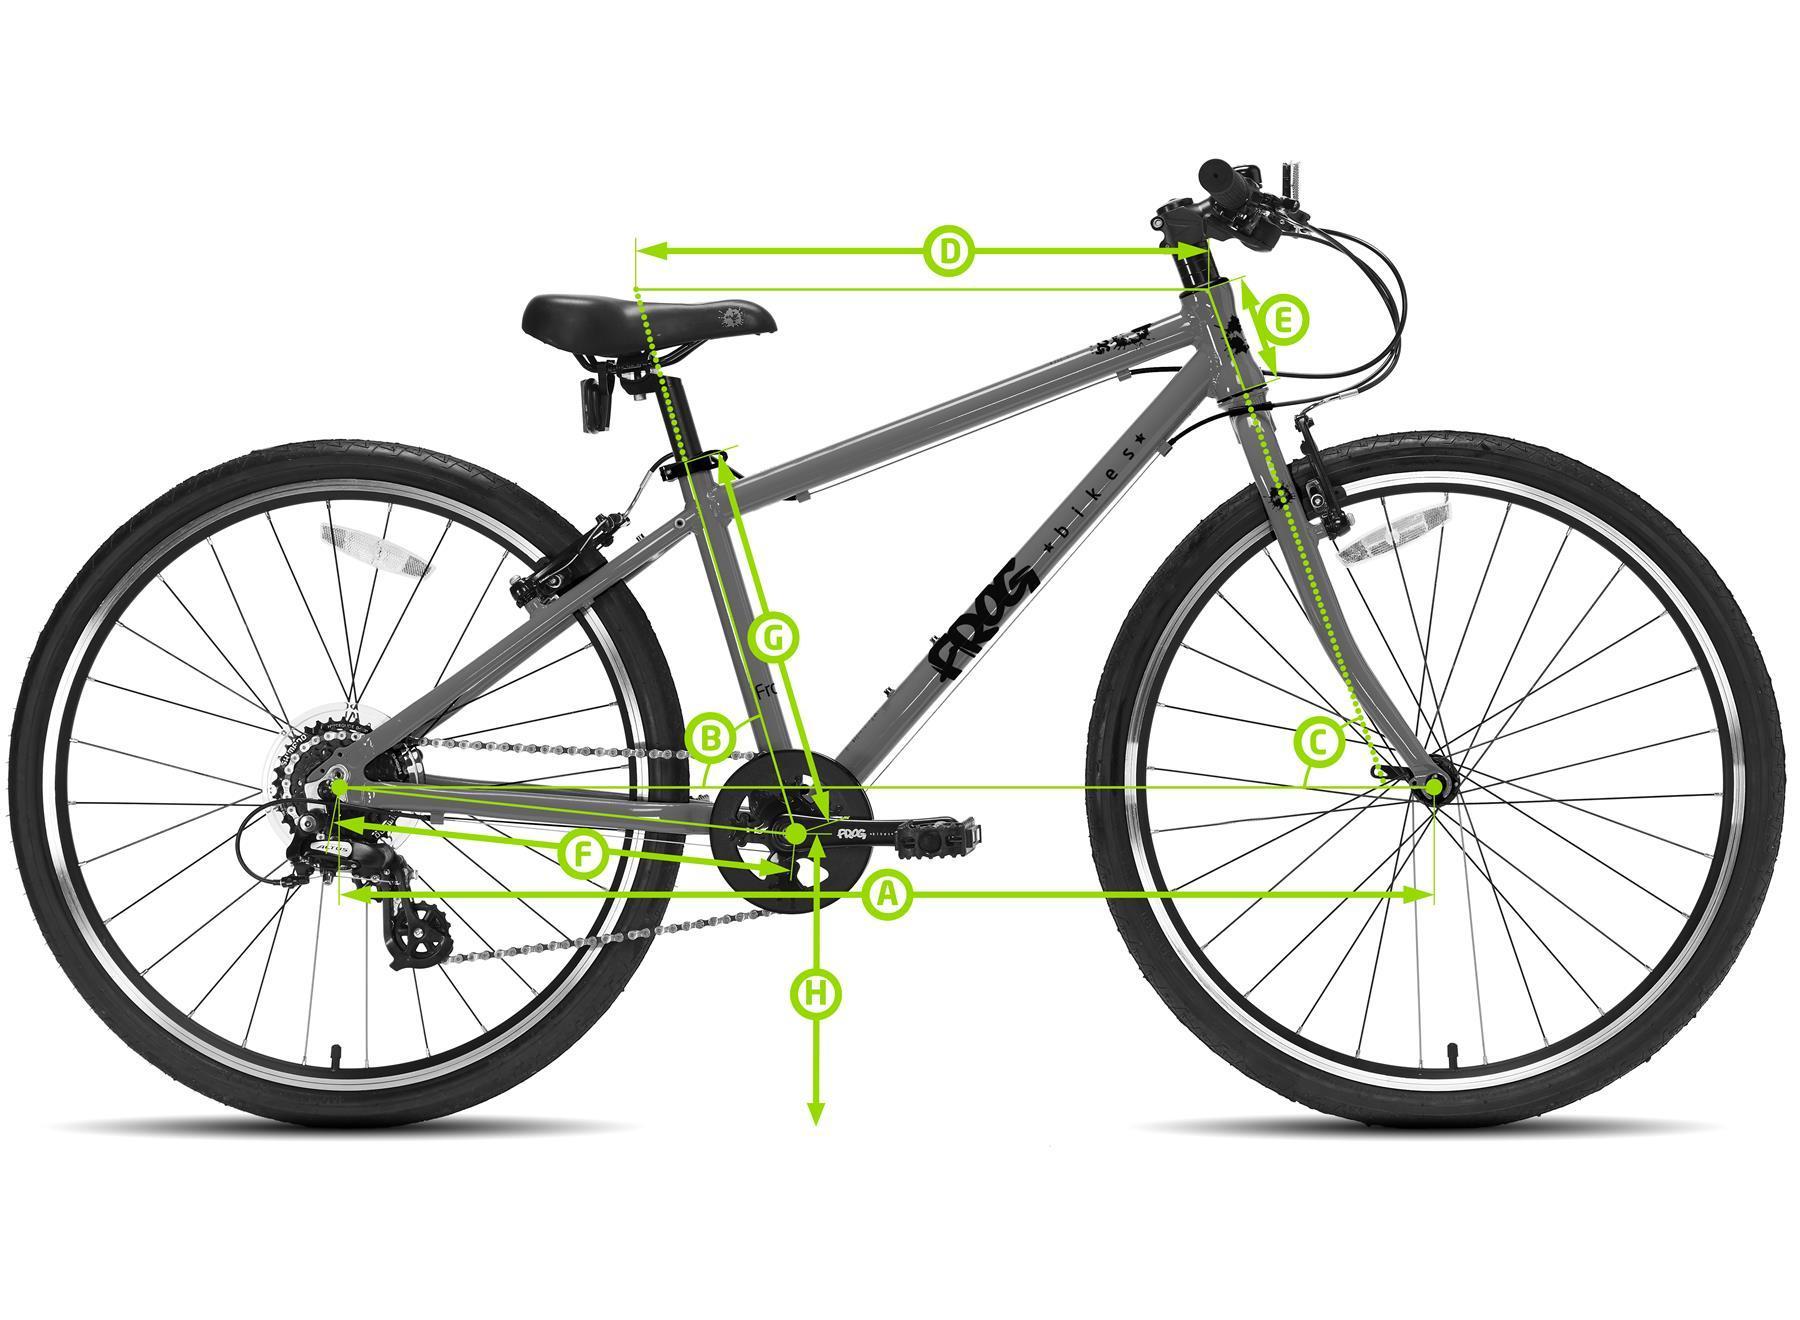 Frog First Pedal 73 Bike Geometry